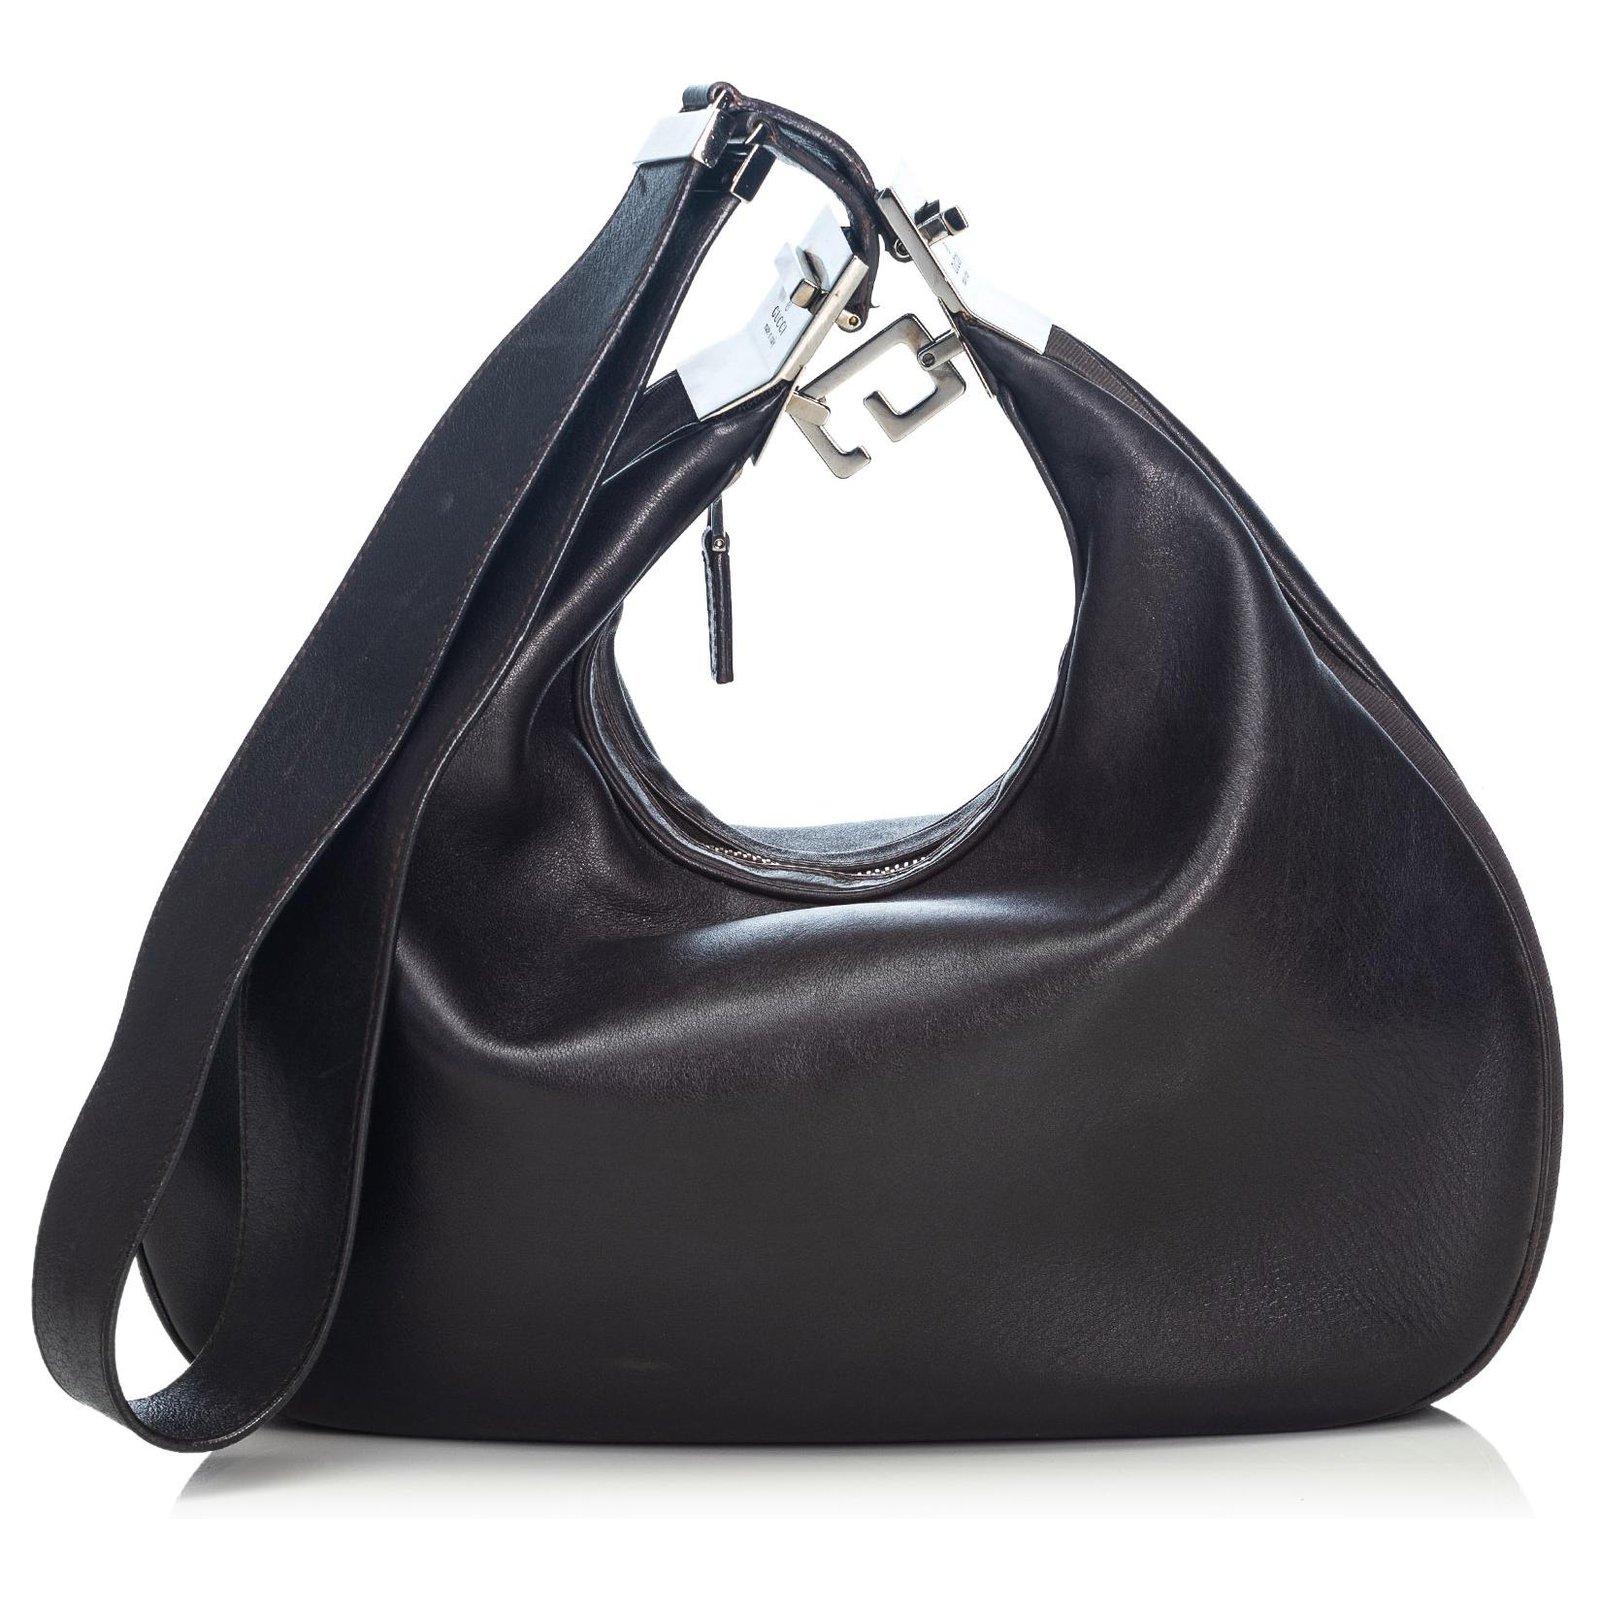 0ca85dbbc Gucci Gucci Black Leather Hobo Bag Handbags Leather,Other Black ref.124015